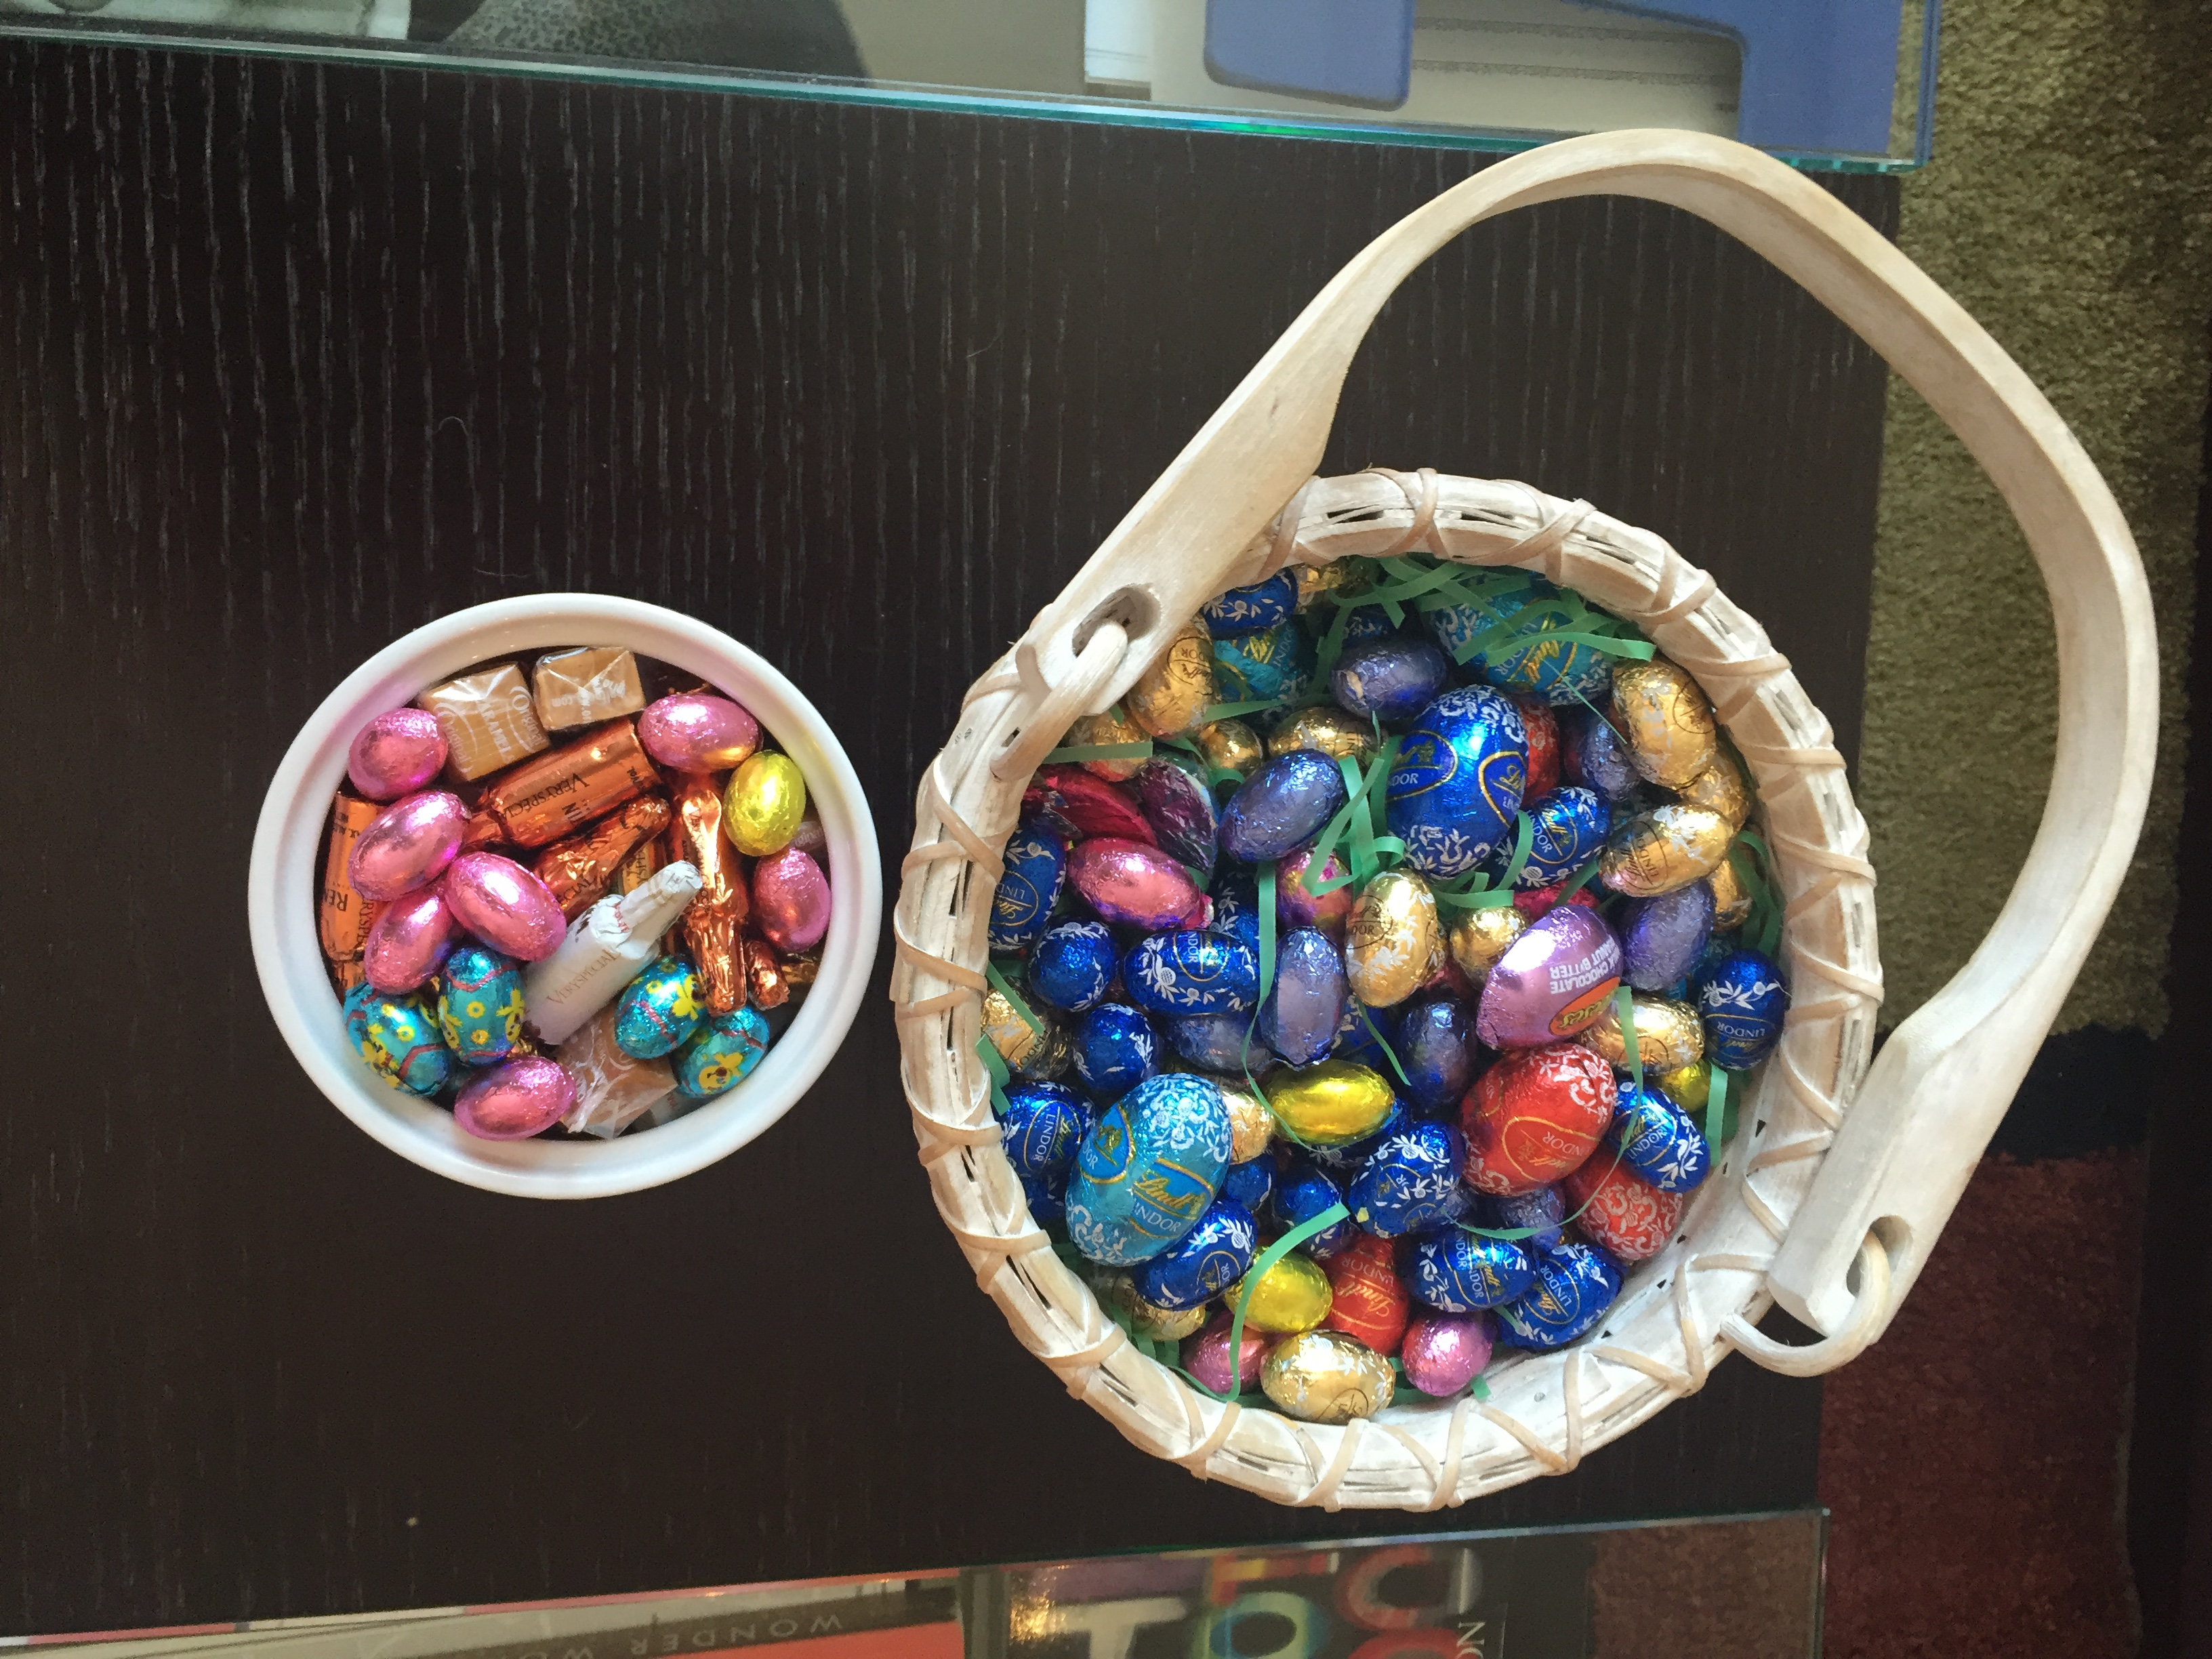 Two baskets of chocolate Easter eggs. CITYNEWS/Diana Pereira